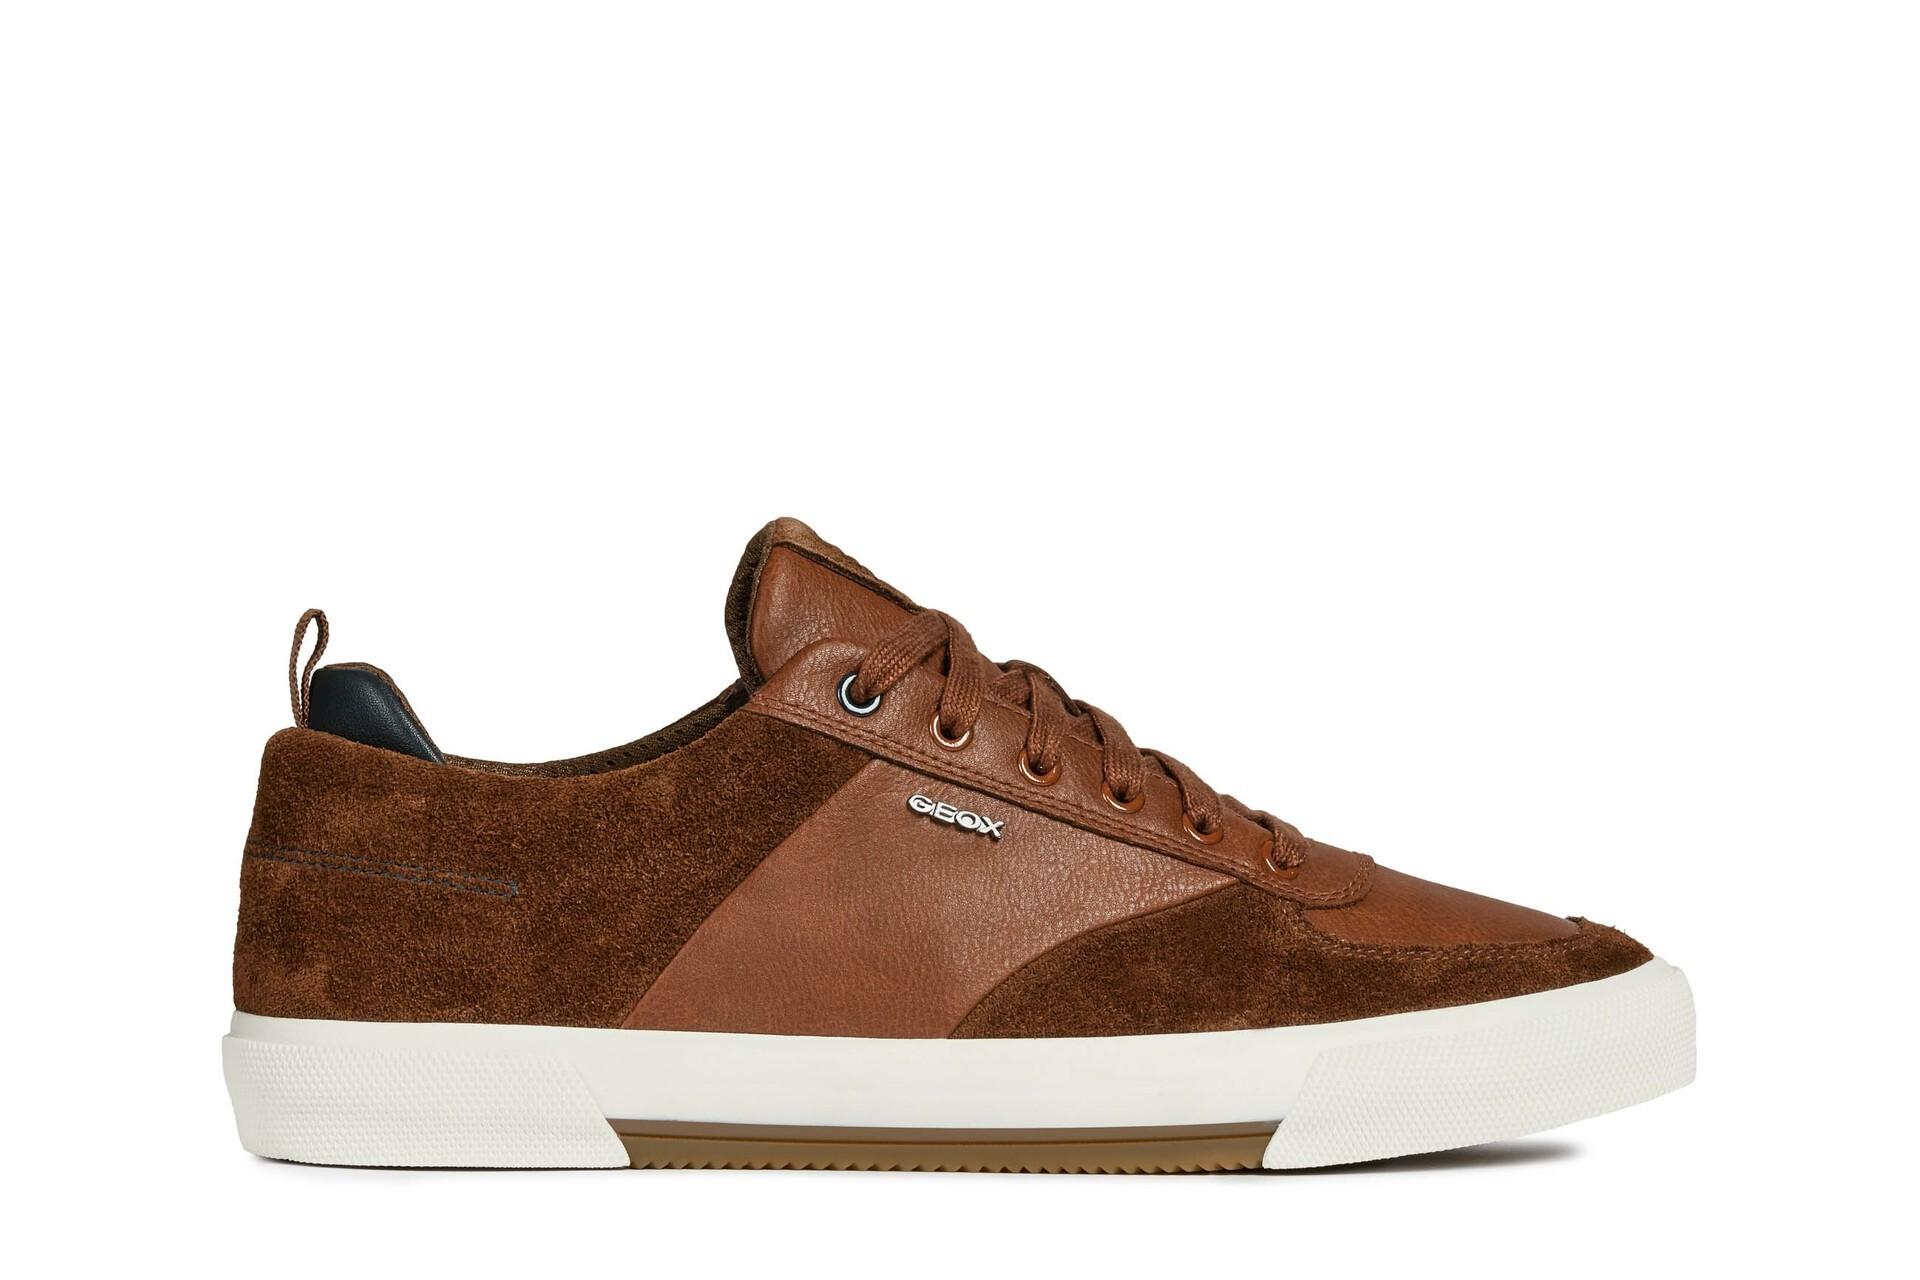 Geox Mens Shoes | Kaven | Brown-Cognac